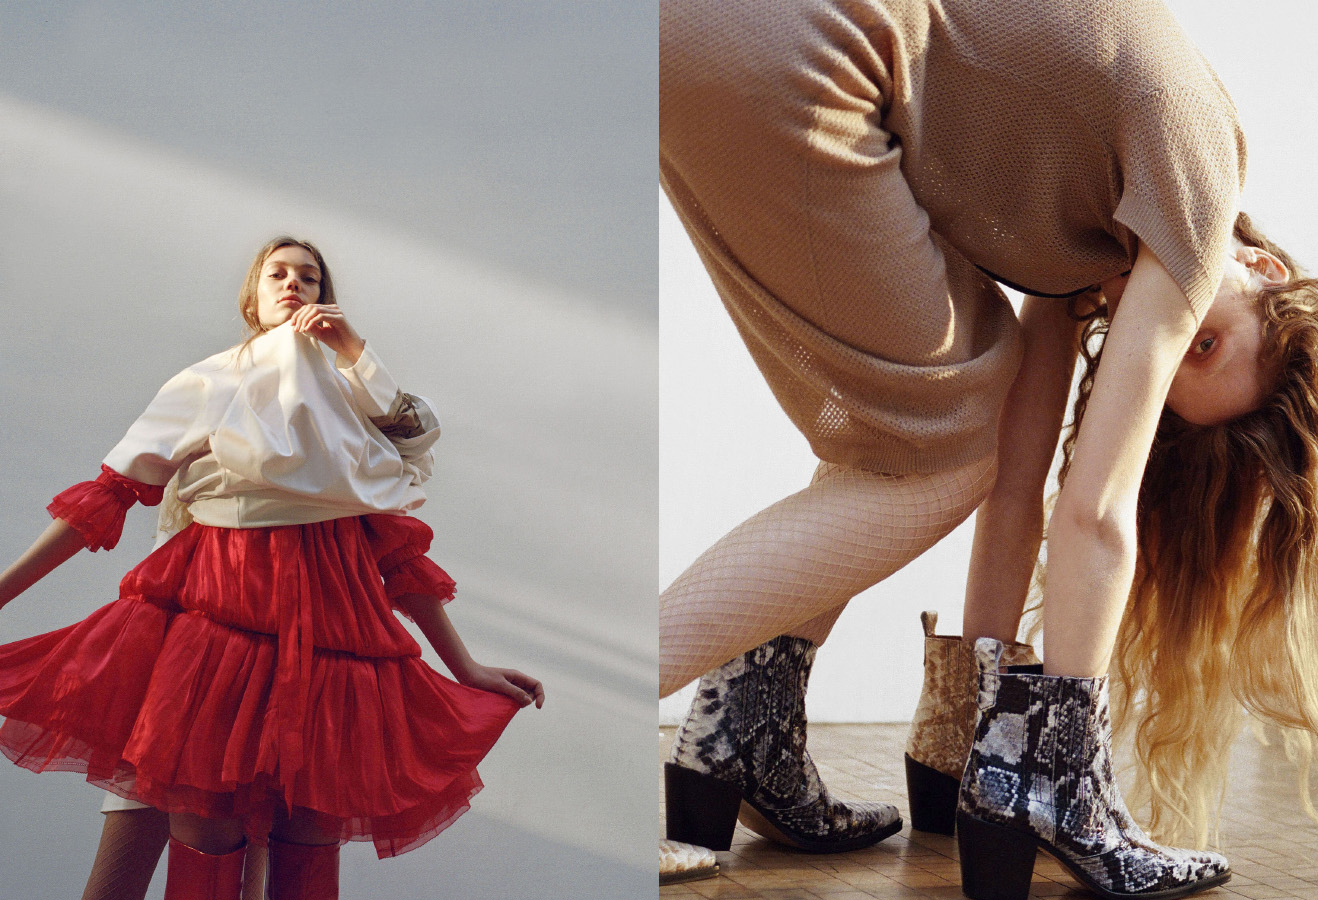 Lydia wears dress   ANGEL CHEN   t-shirt   WAN HUNG   boots  STYLIST'S OWN . Franny wears dress   LUAR  . Franny wears dress   ASTRID ANDERSEN   boots   GANNI